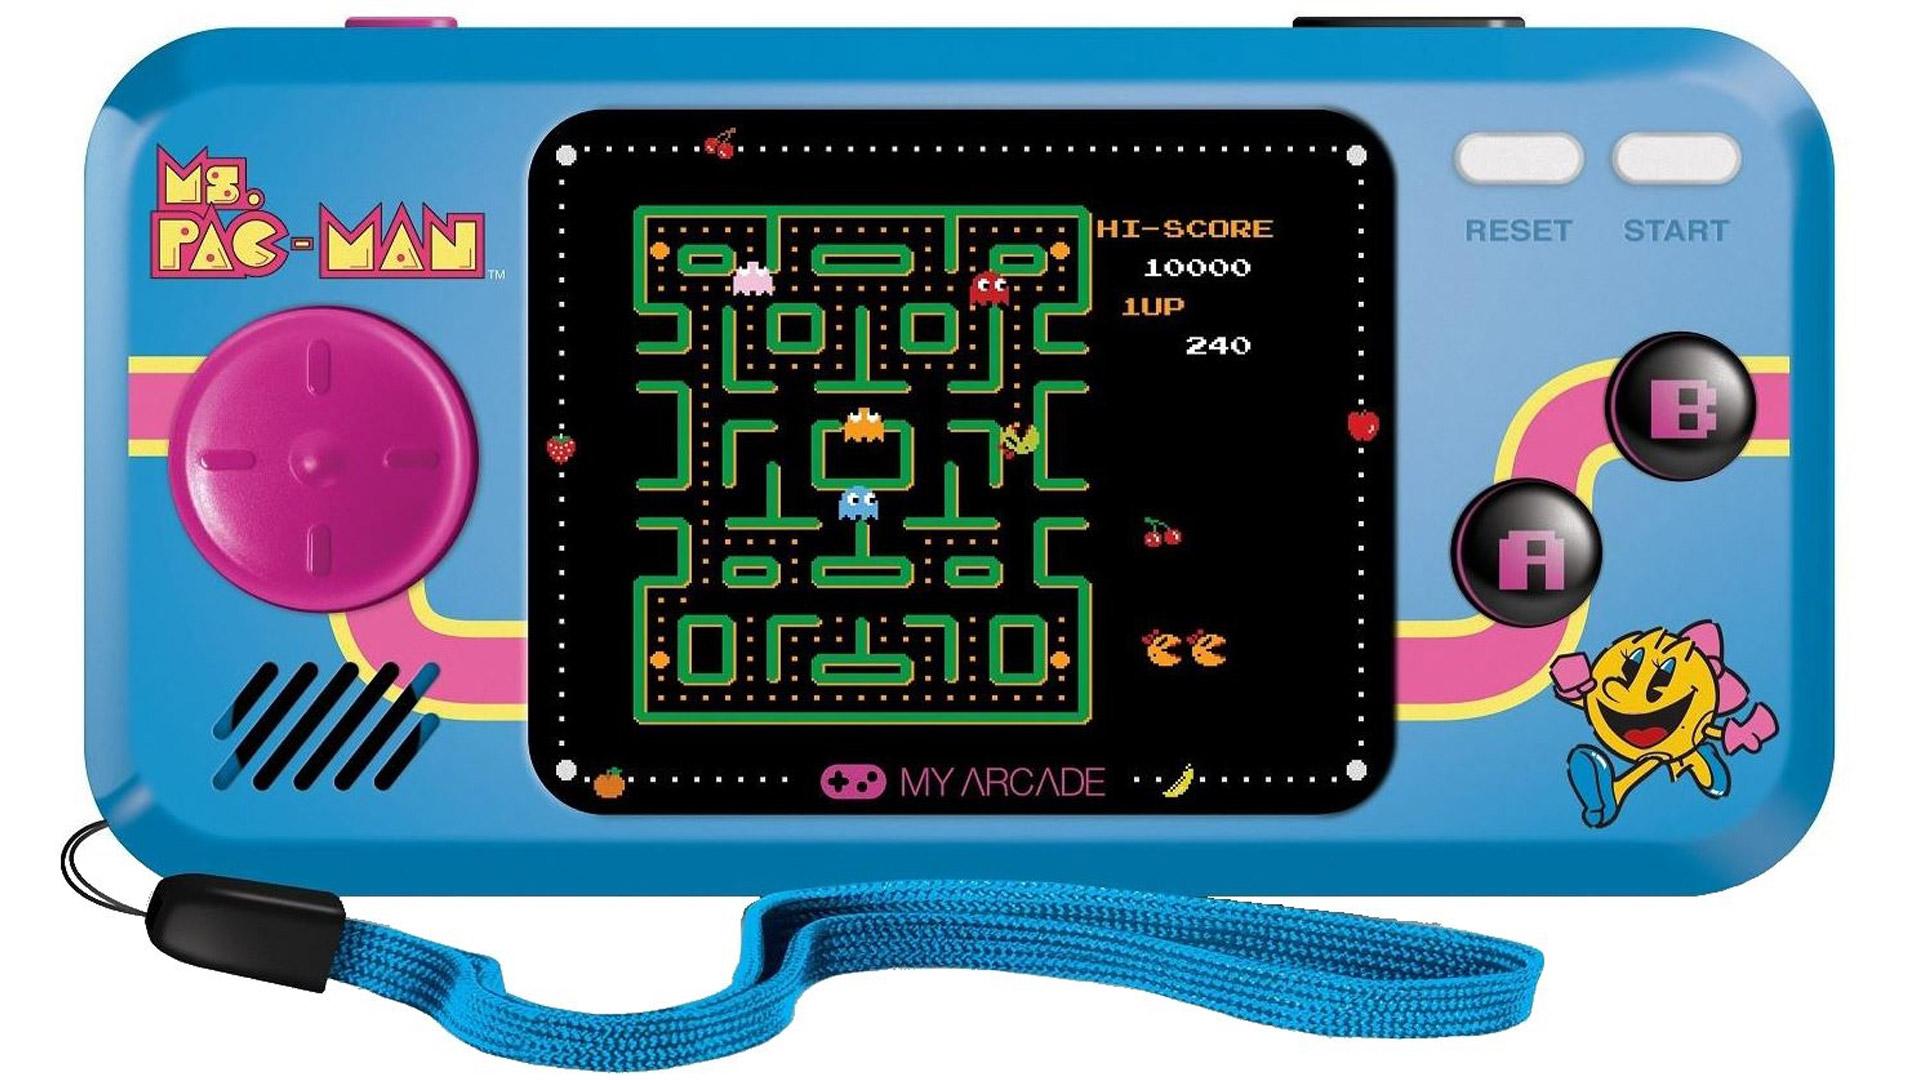 My Arcade Ms. Pac-Man Pocket Player